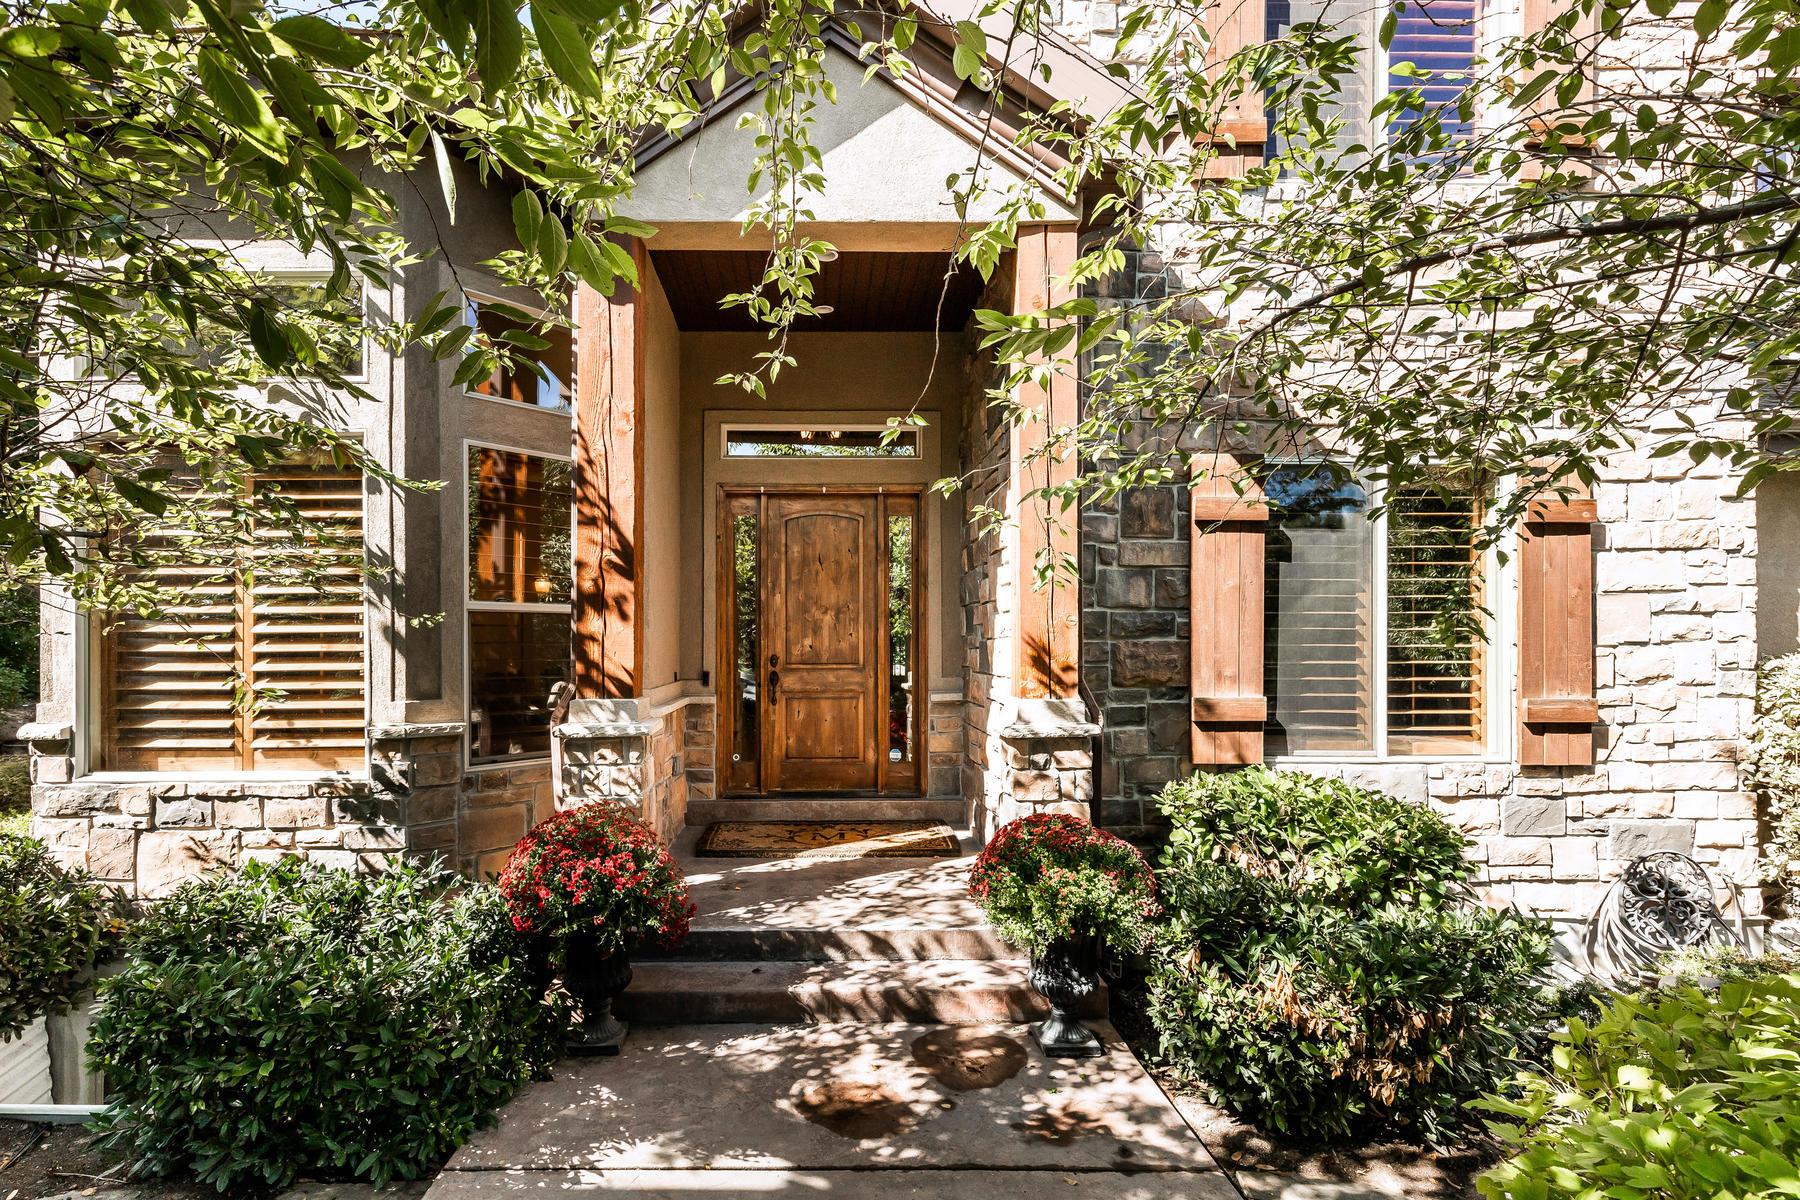 Single Family Homes for Sale at Designed for Modern Living 4756 Hidden Woods Ln, Murray, Utah 84107 United States